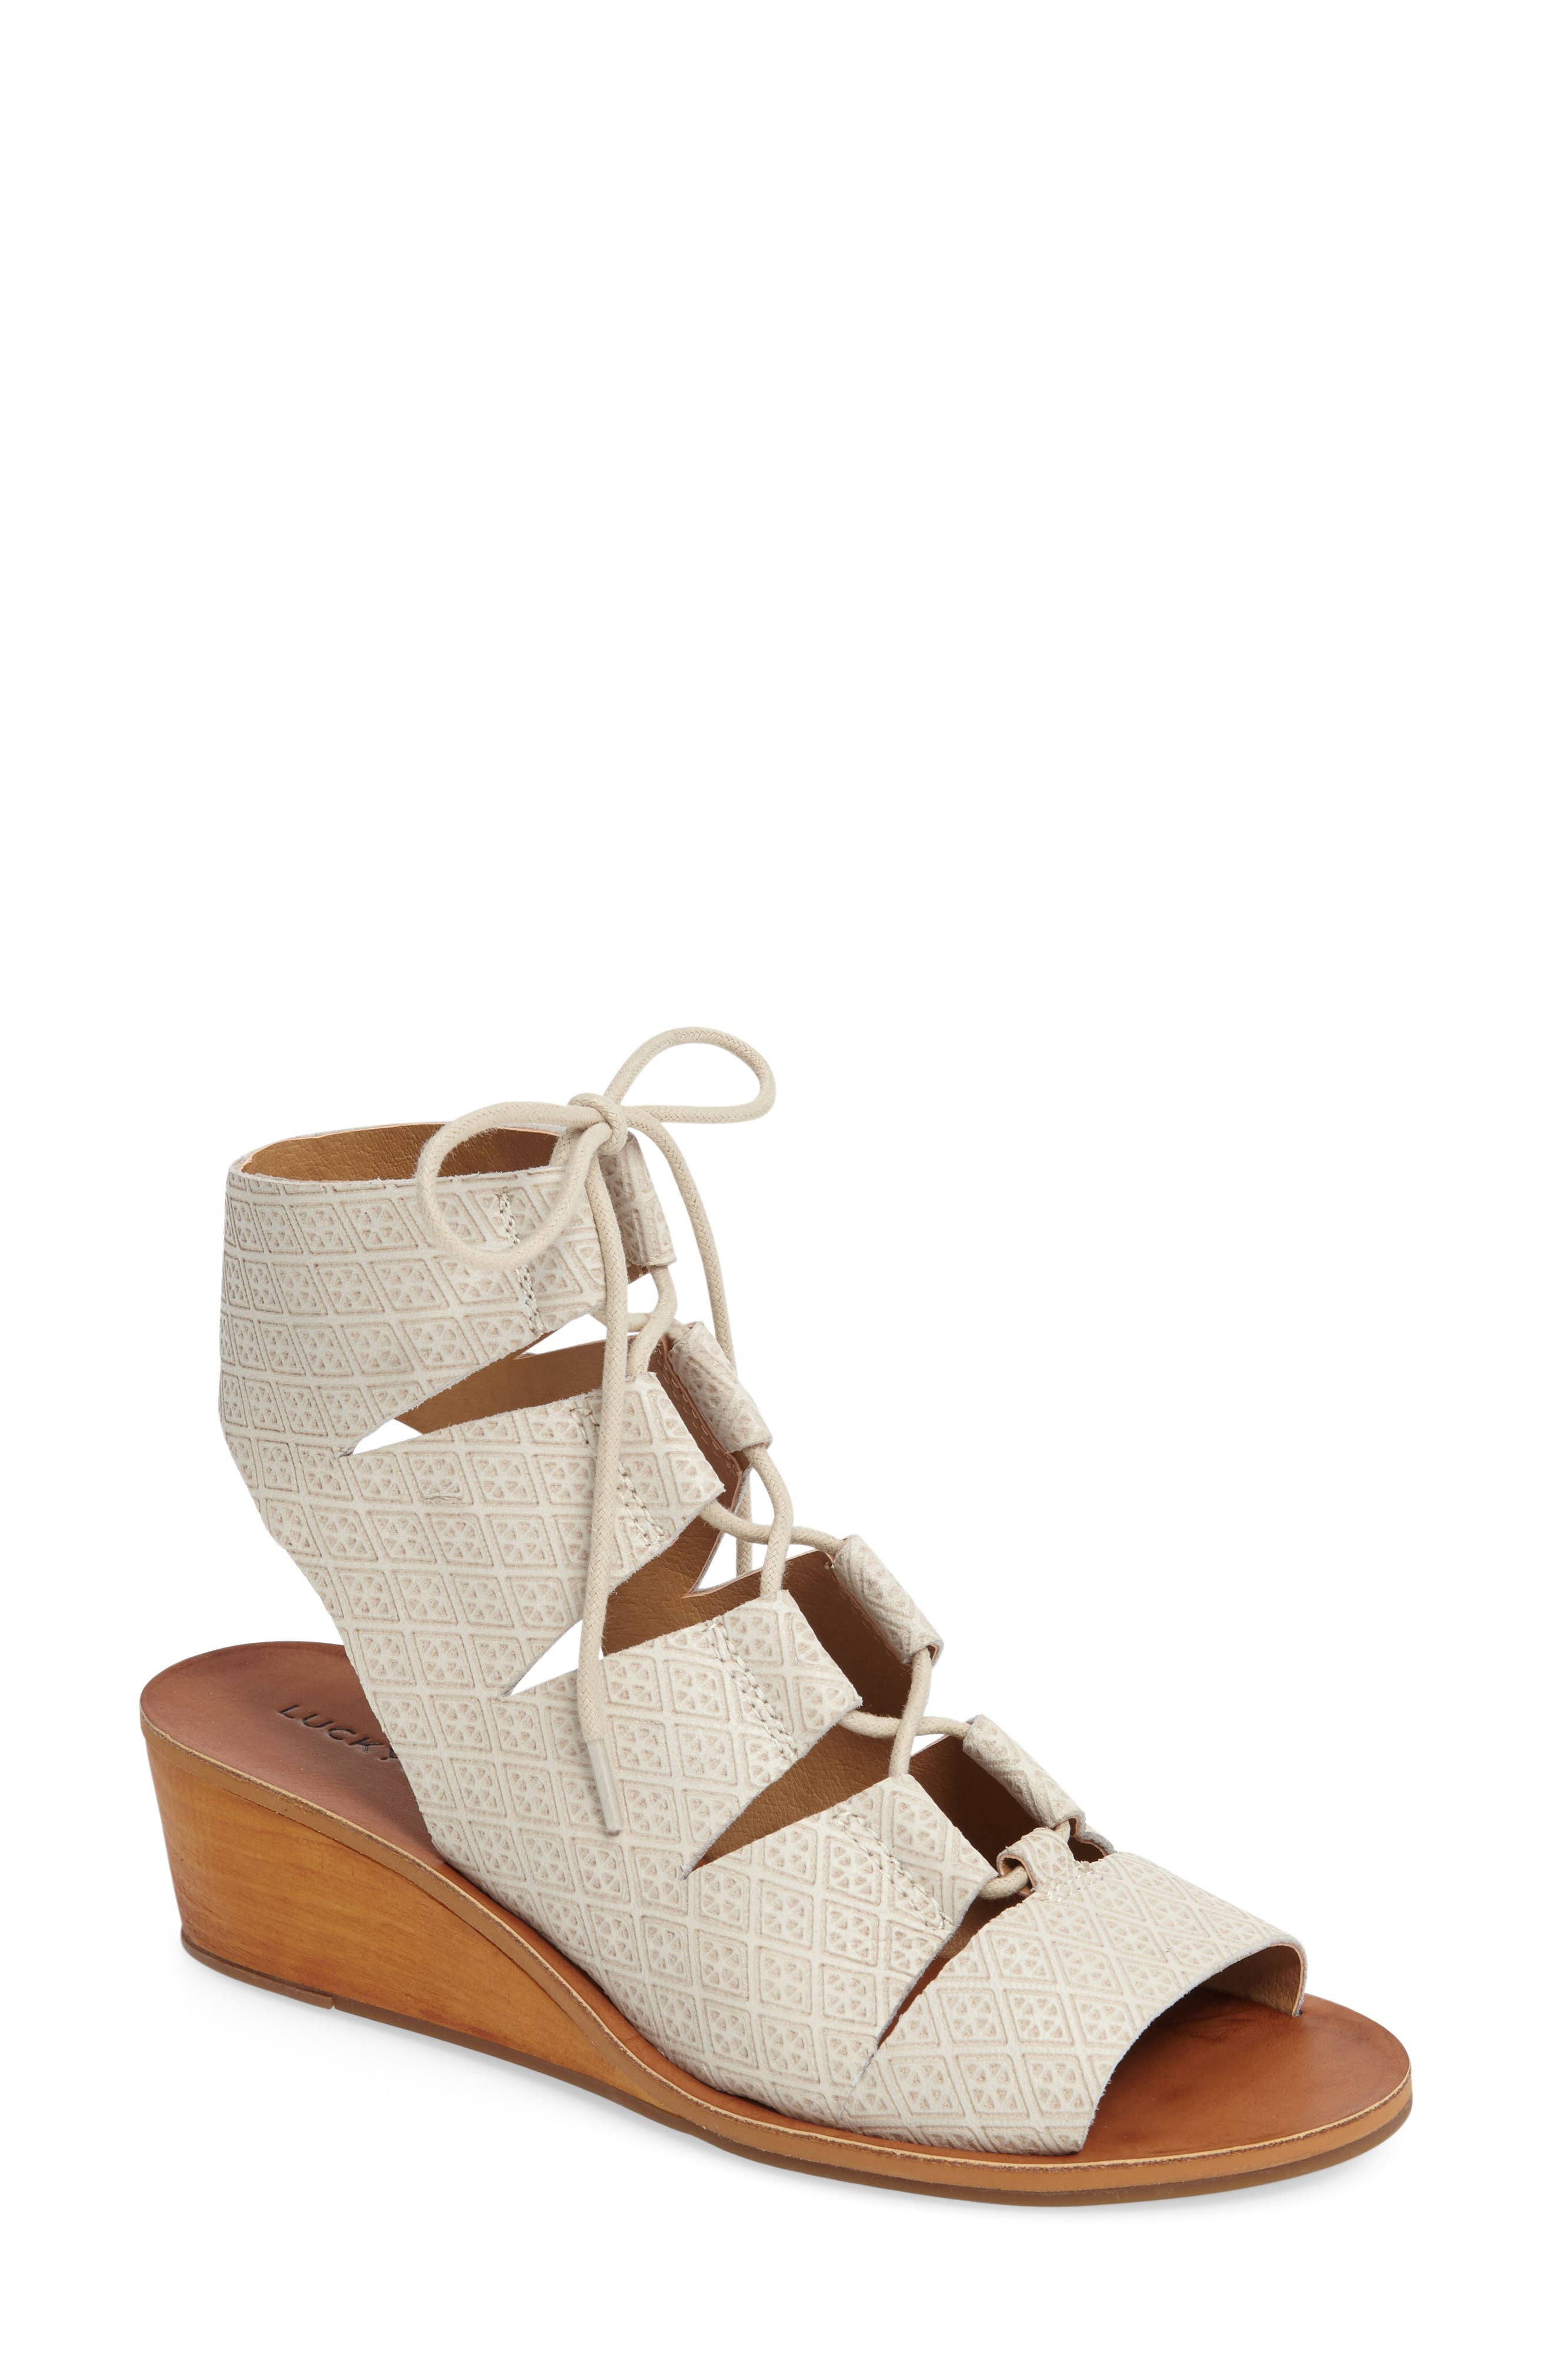 Main Image - Lucky Brand Gizi Wedge Sandal (Women)